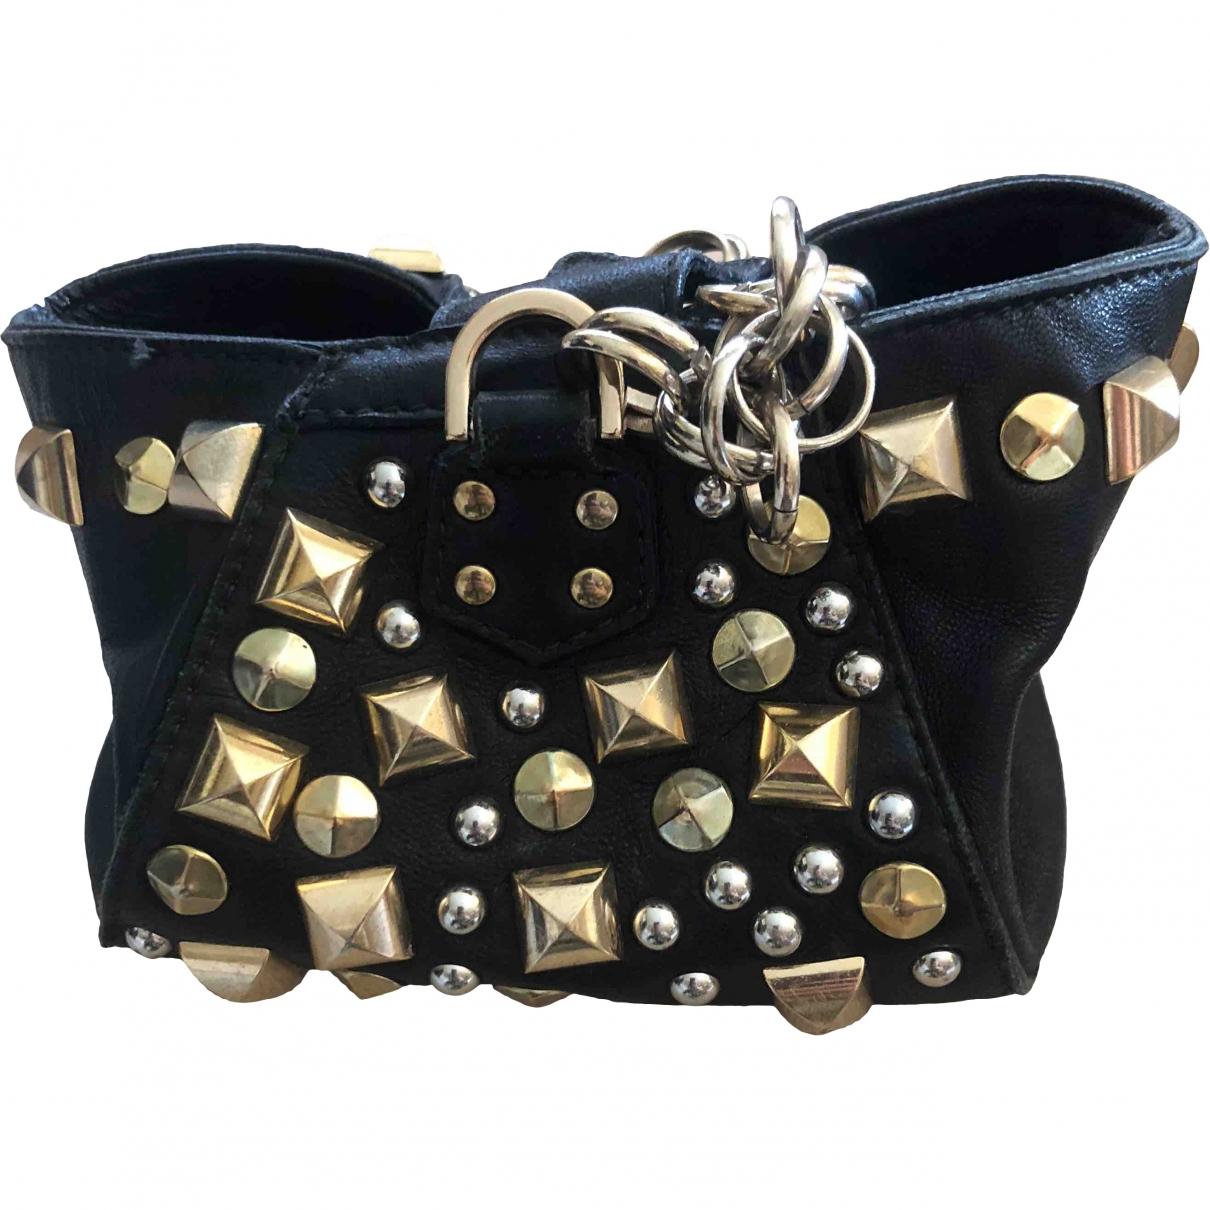 Versace X H&m \N Black Leather Clutch bag for Women \N